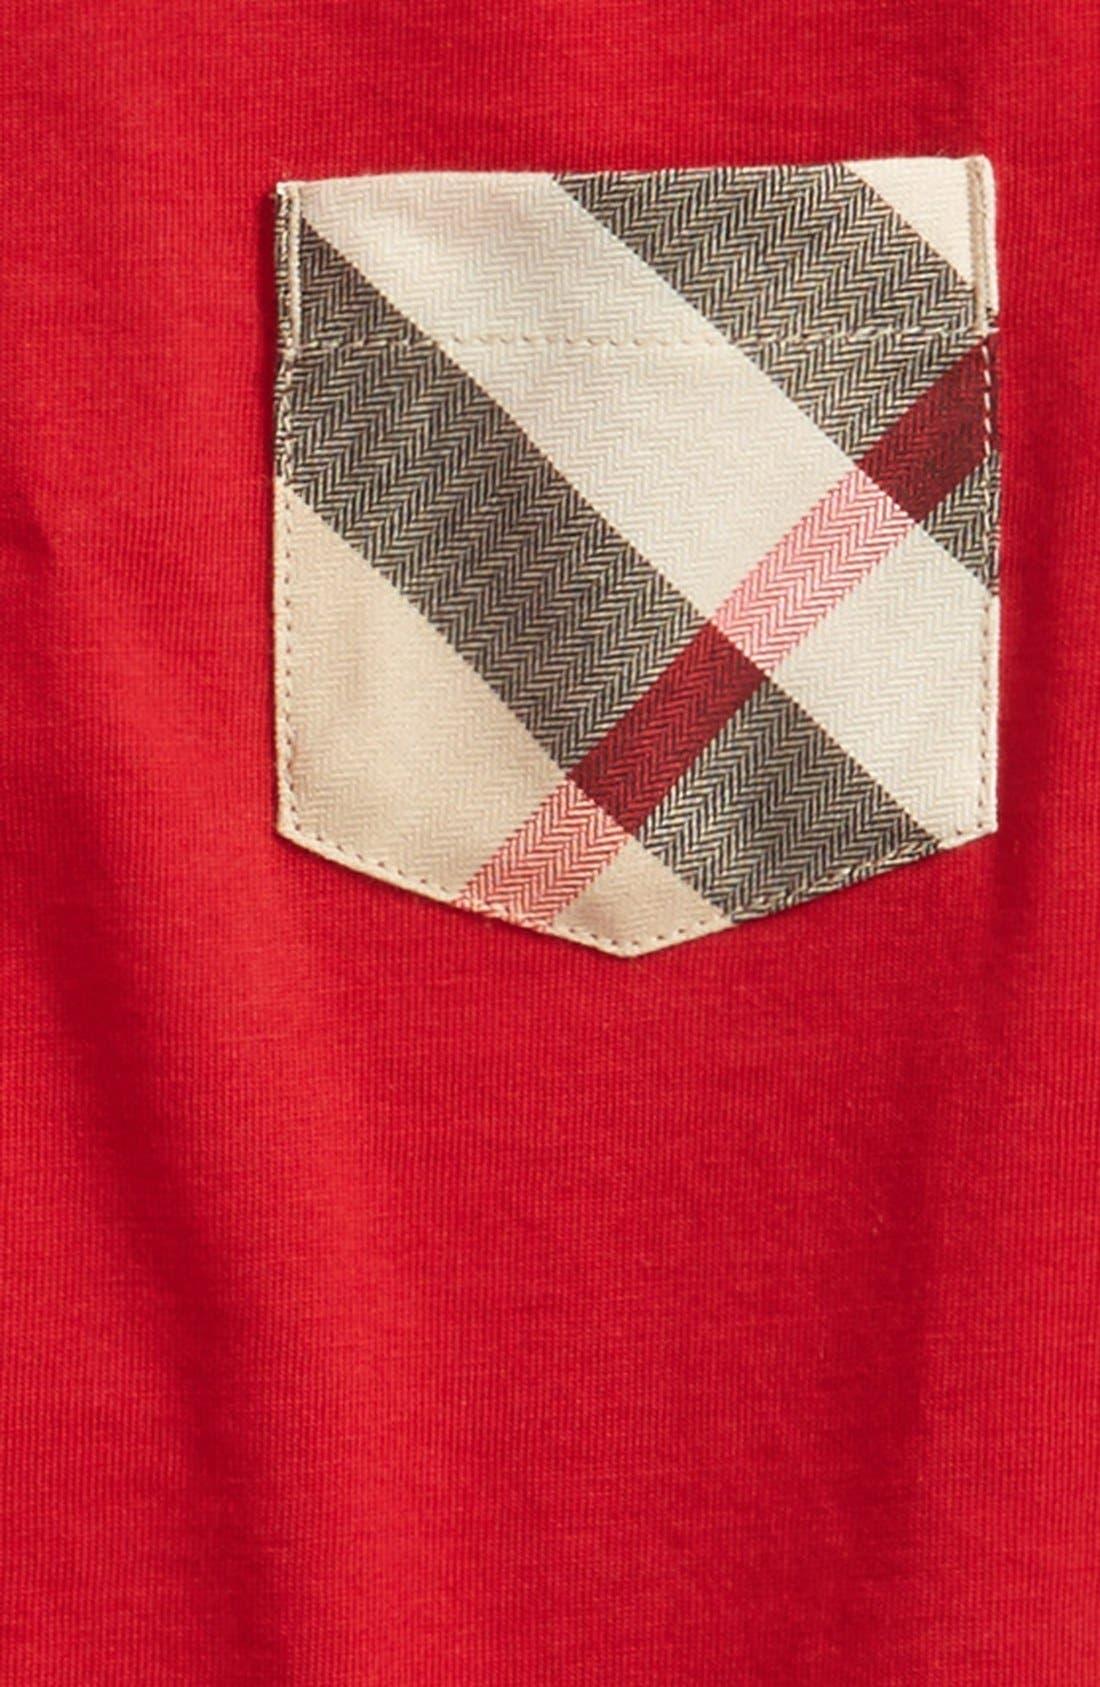 Alternate Image 2  - Burberry Contrast Pocket T-Shirt (Little Boys & Big Boys)